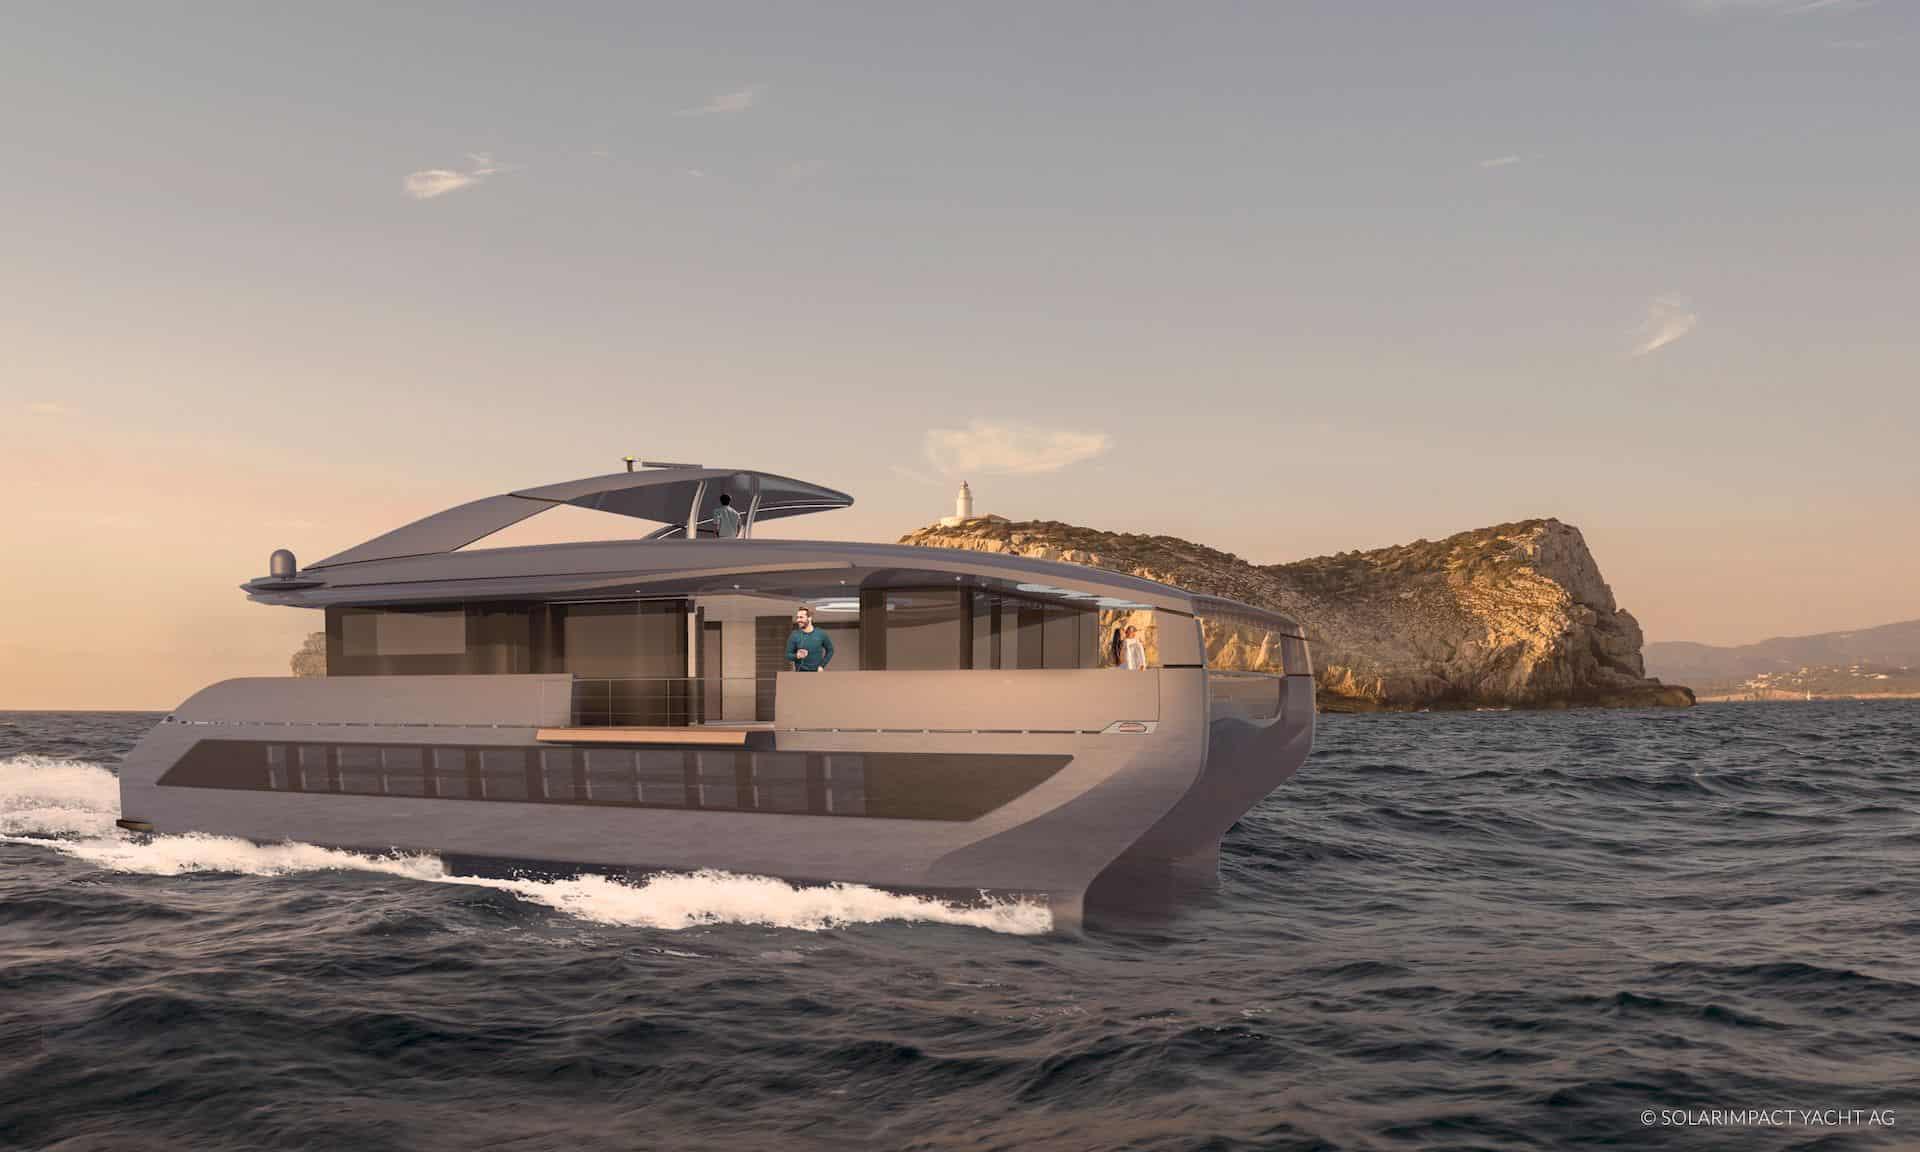 SOLARIMPACT Yacht 3